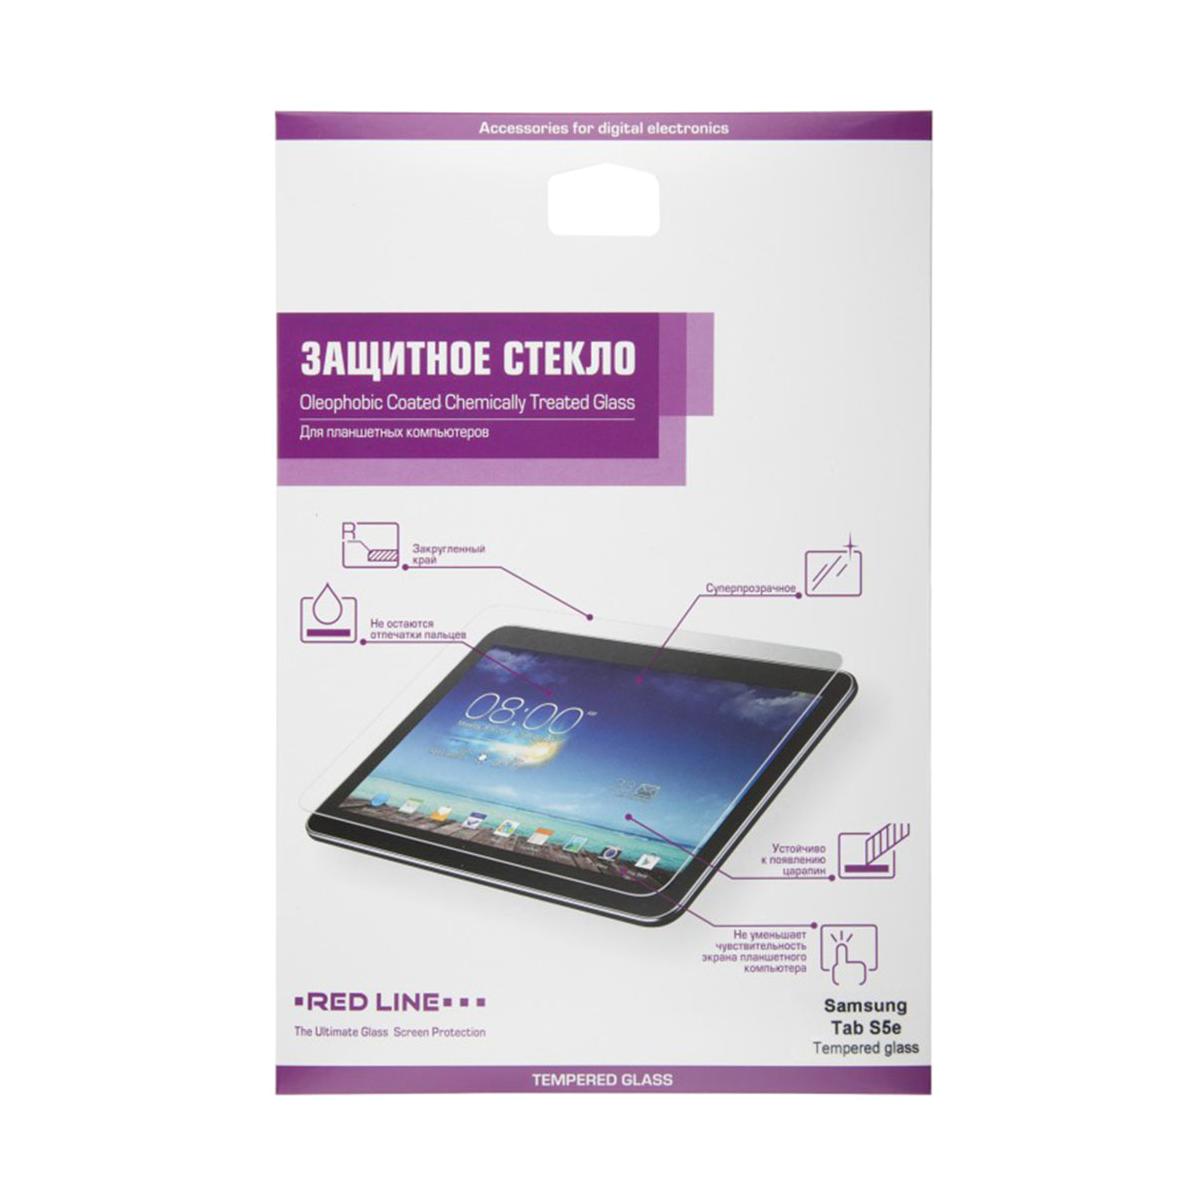 Фото - Защитное стекло Red Line tempered glass для Samsung Tab S5e защитное стекло